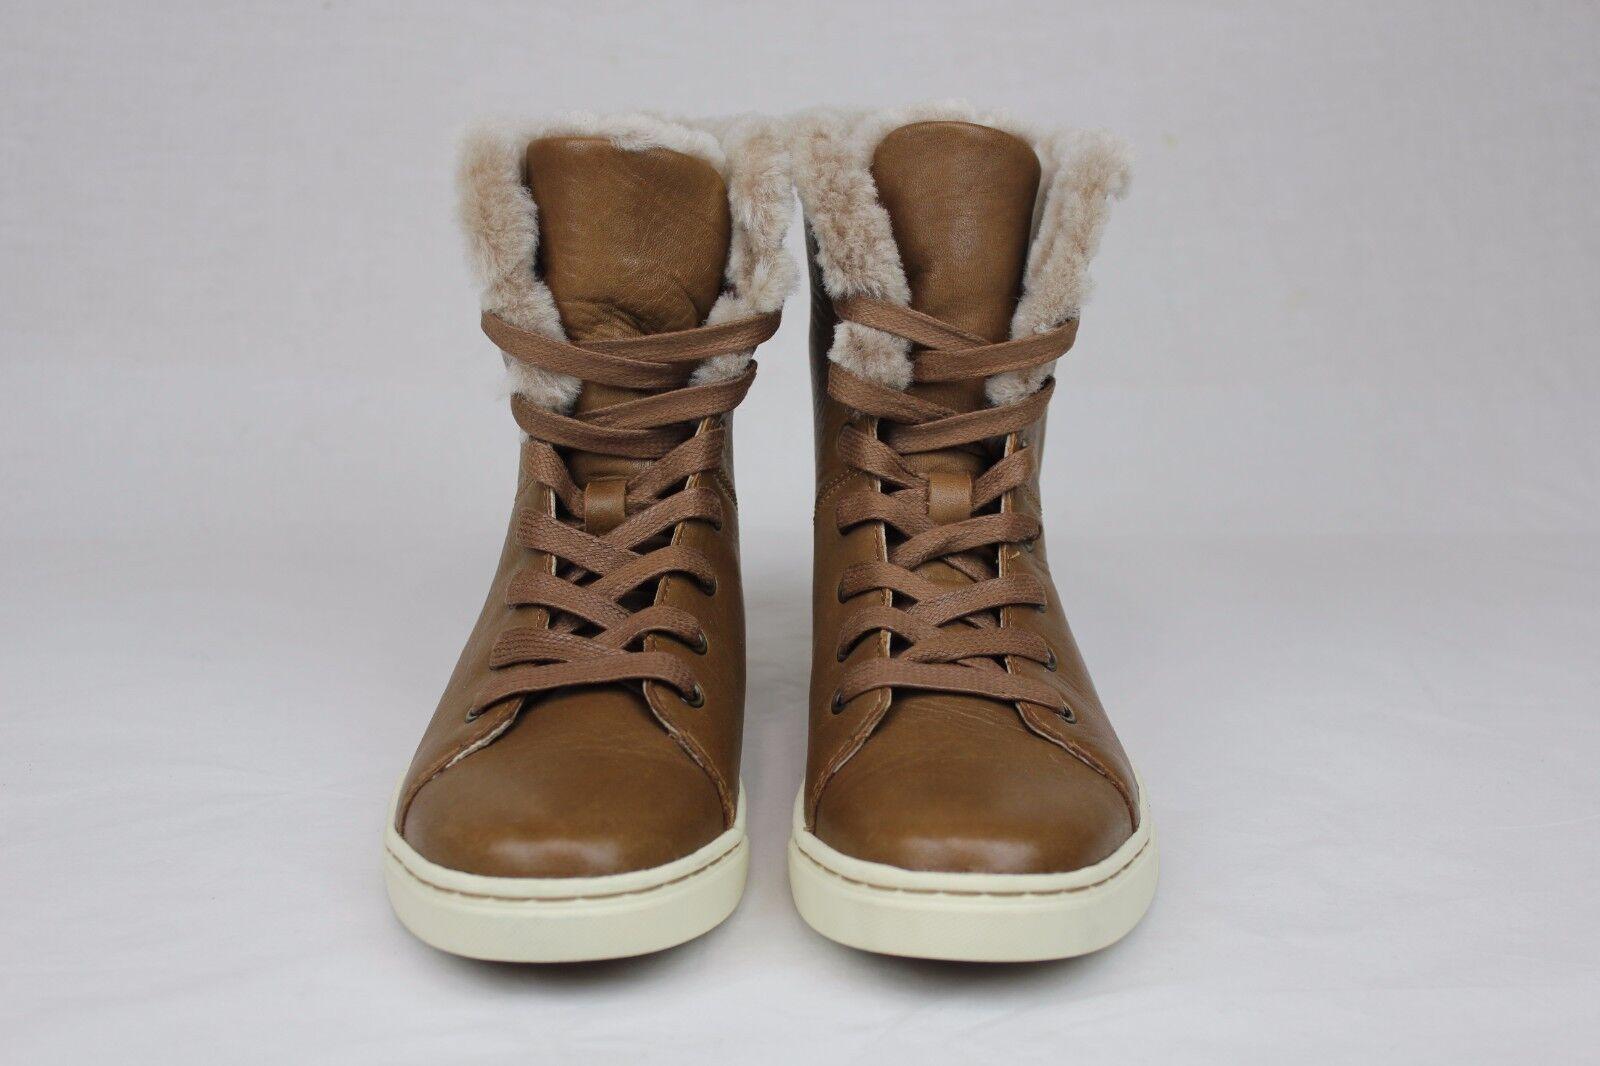 40067c56b93 UGG Australia Croft Luxe Quilt Chestnut Leather Sheepskin Sneaker Size 6.5  US